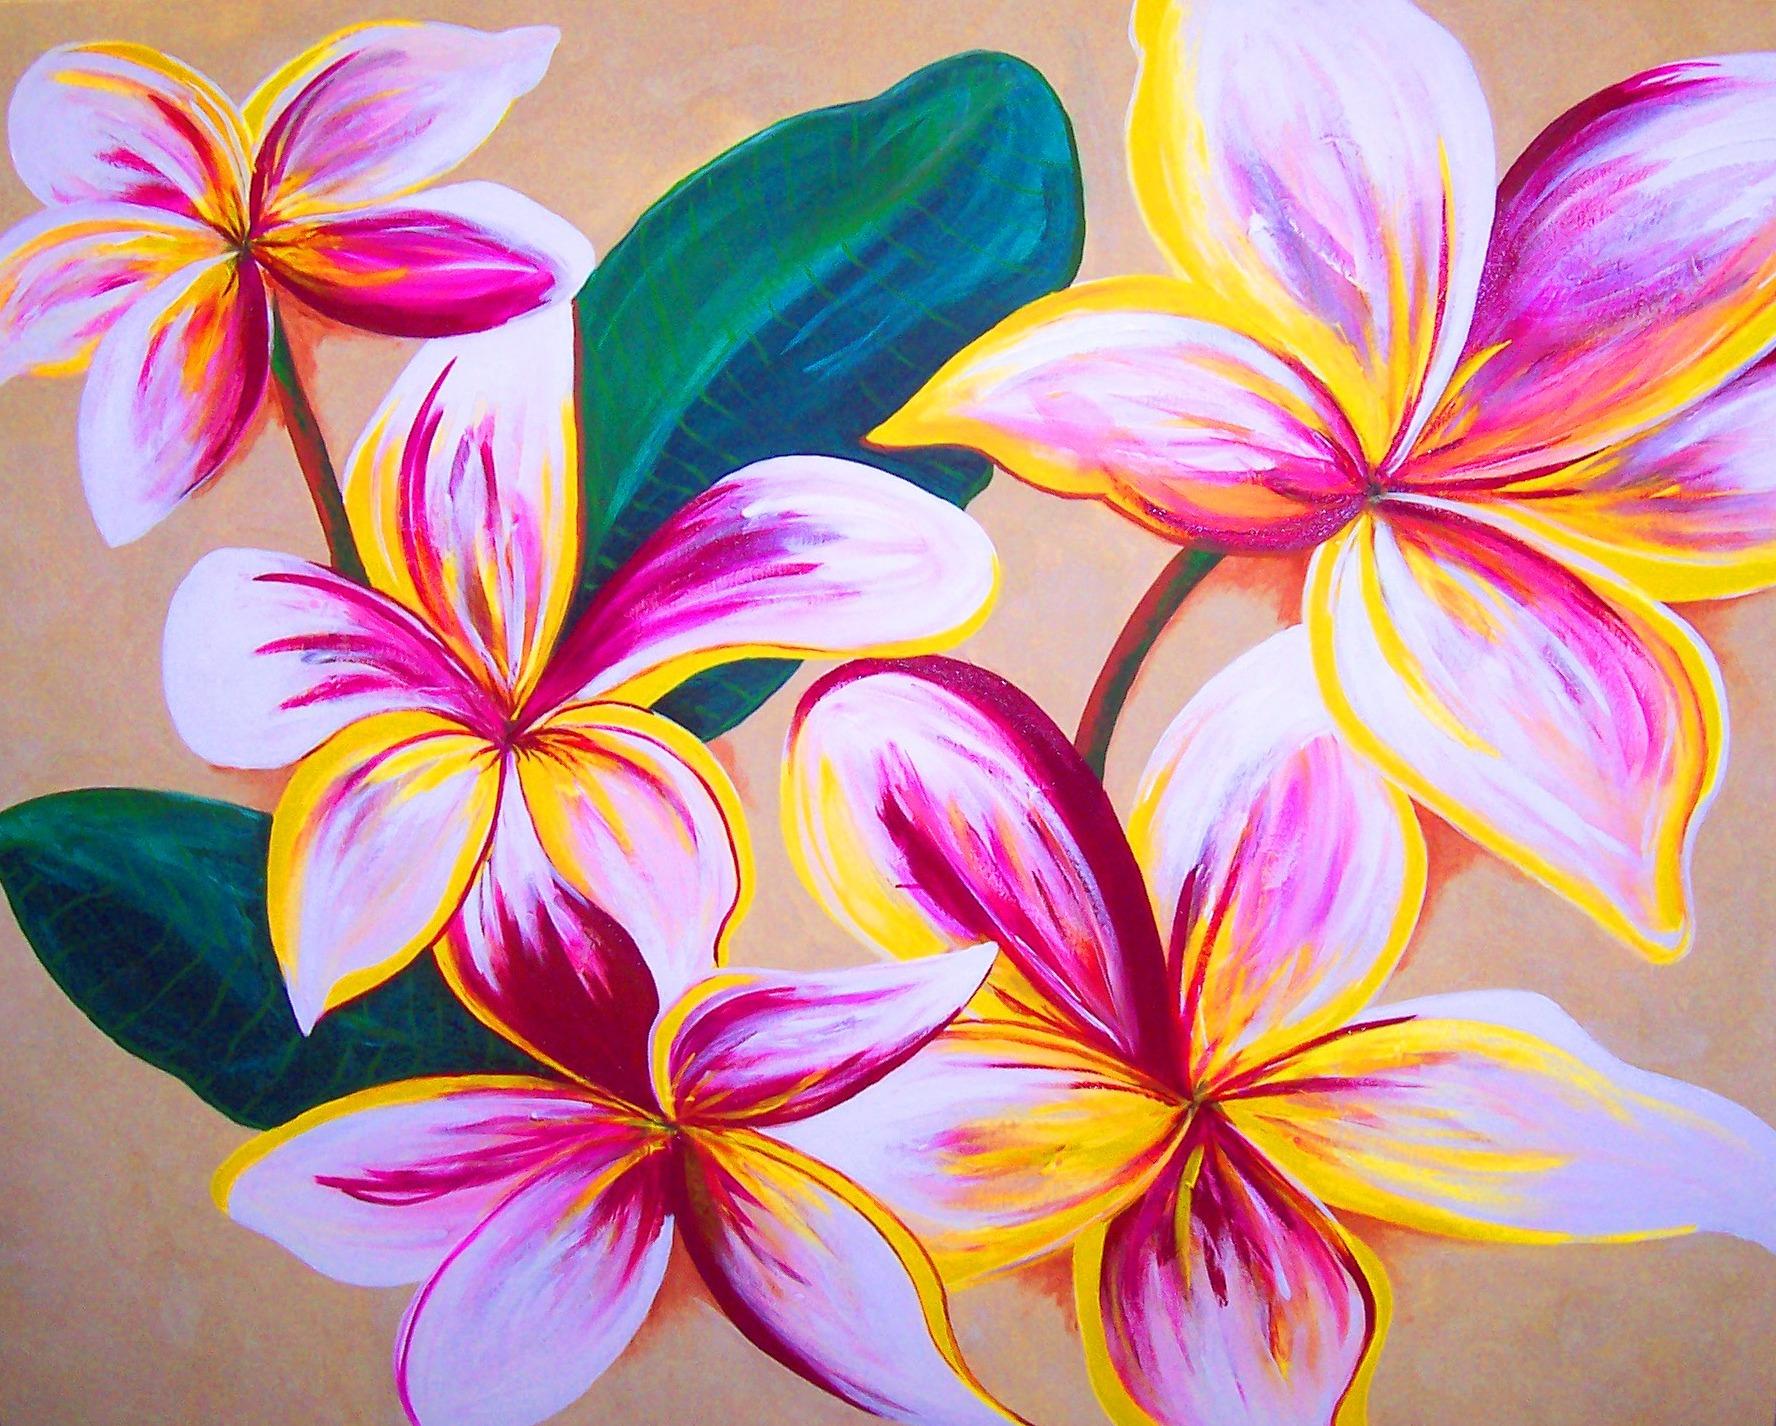 frangipanis artwork gold coast art artist samantha waters flowers